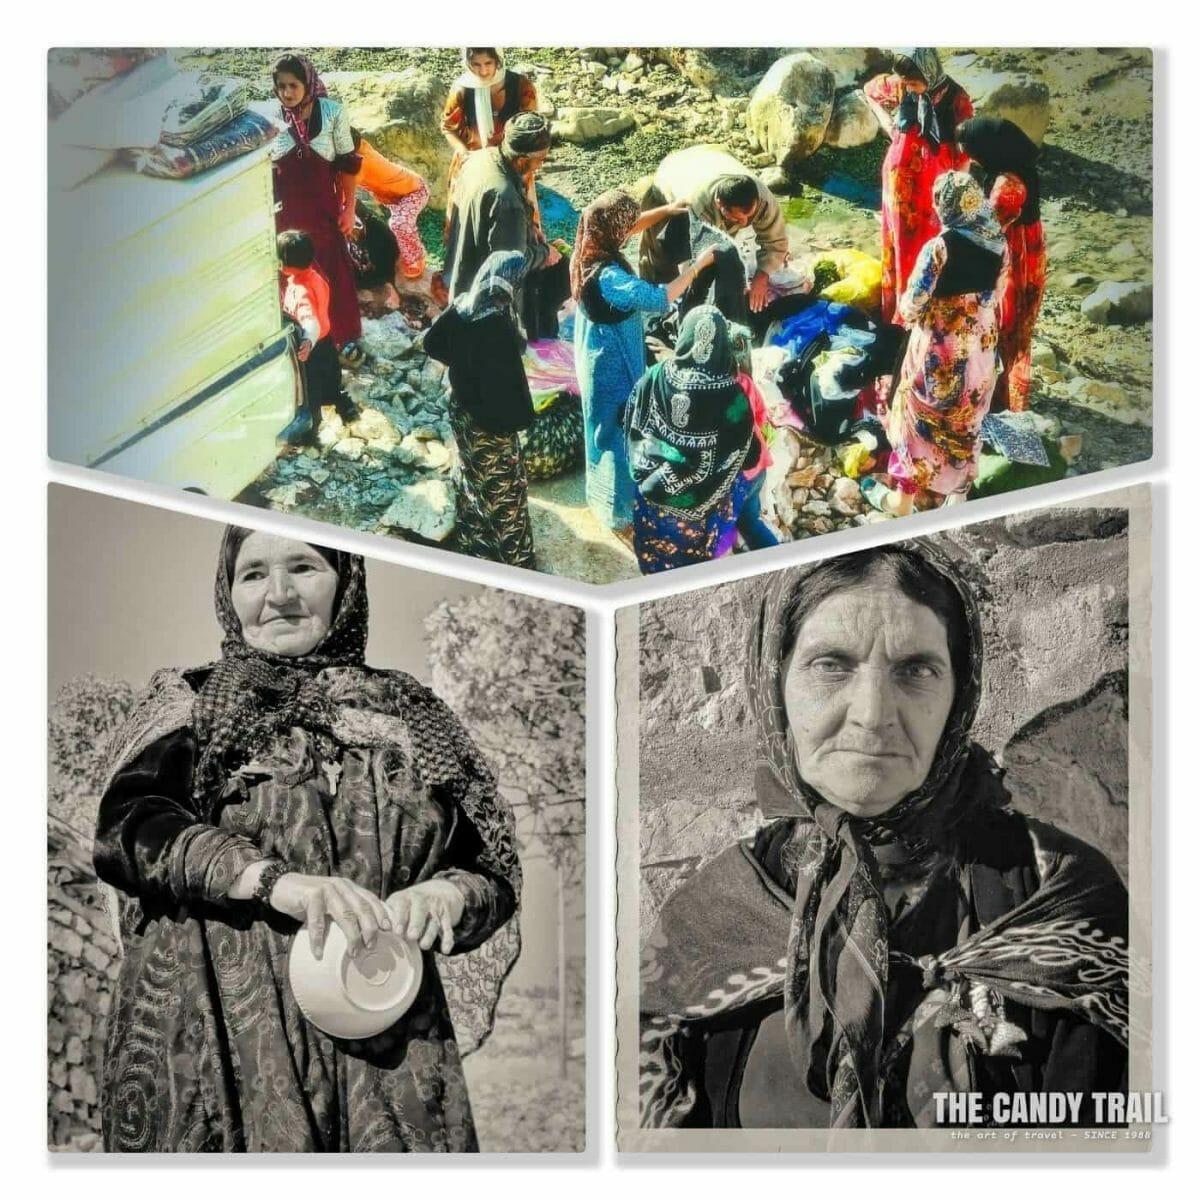 Kurdish Women buying clothes in Palagan village in Iran